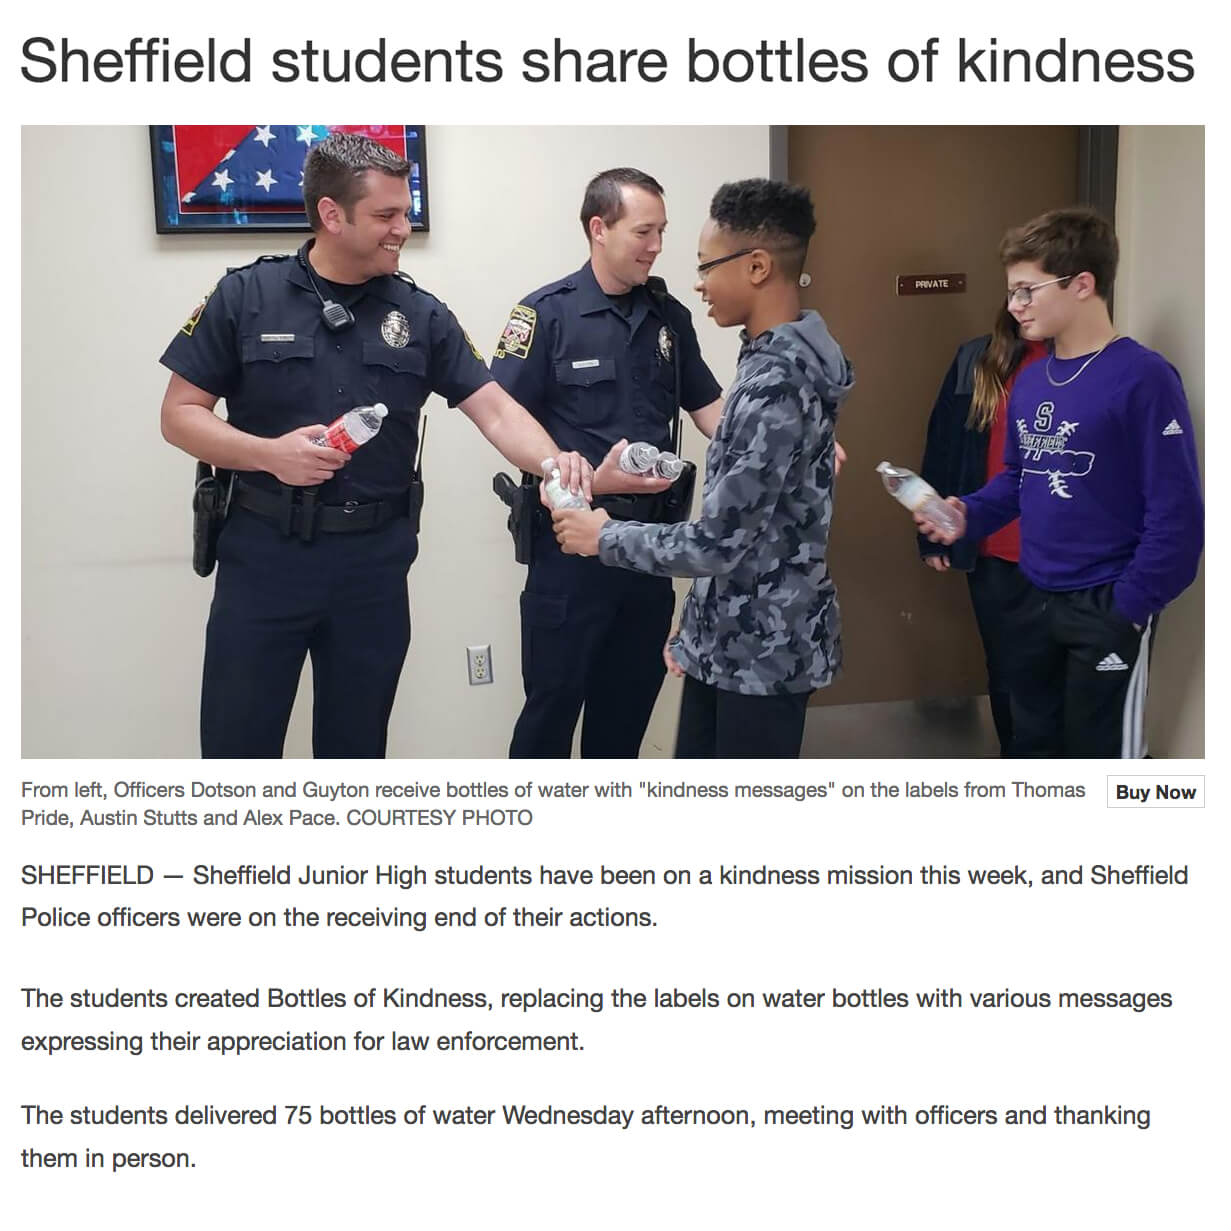 Bottles of Kindness